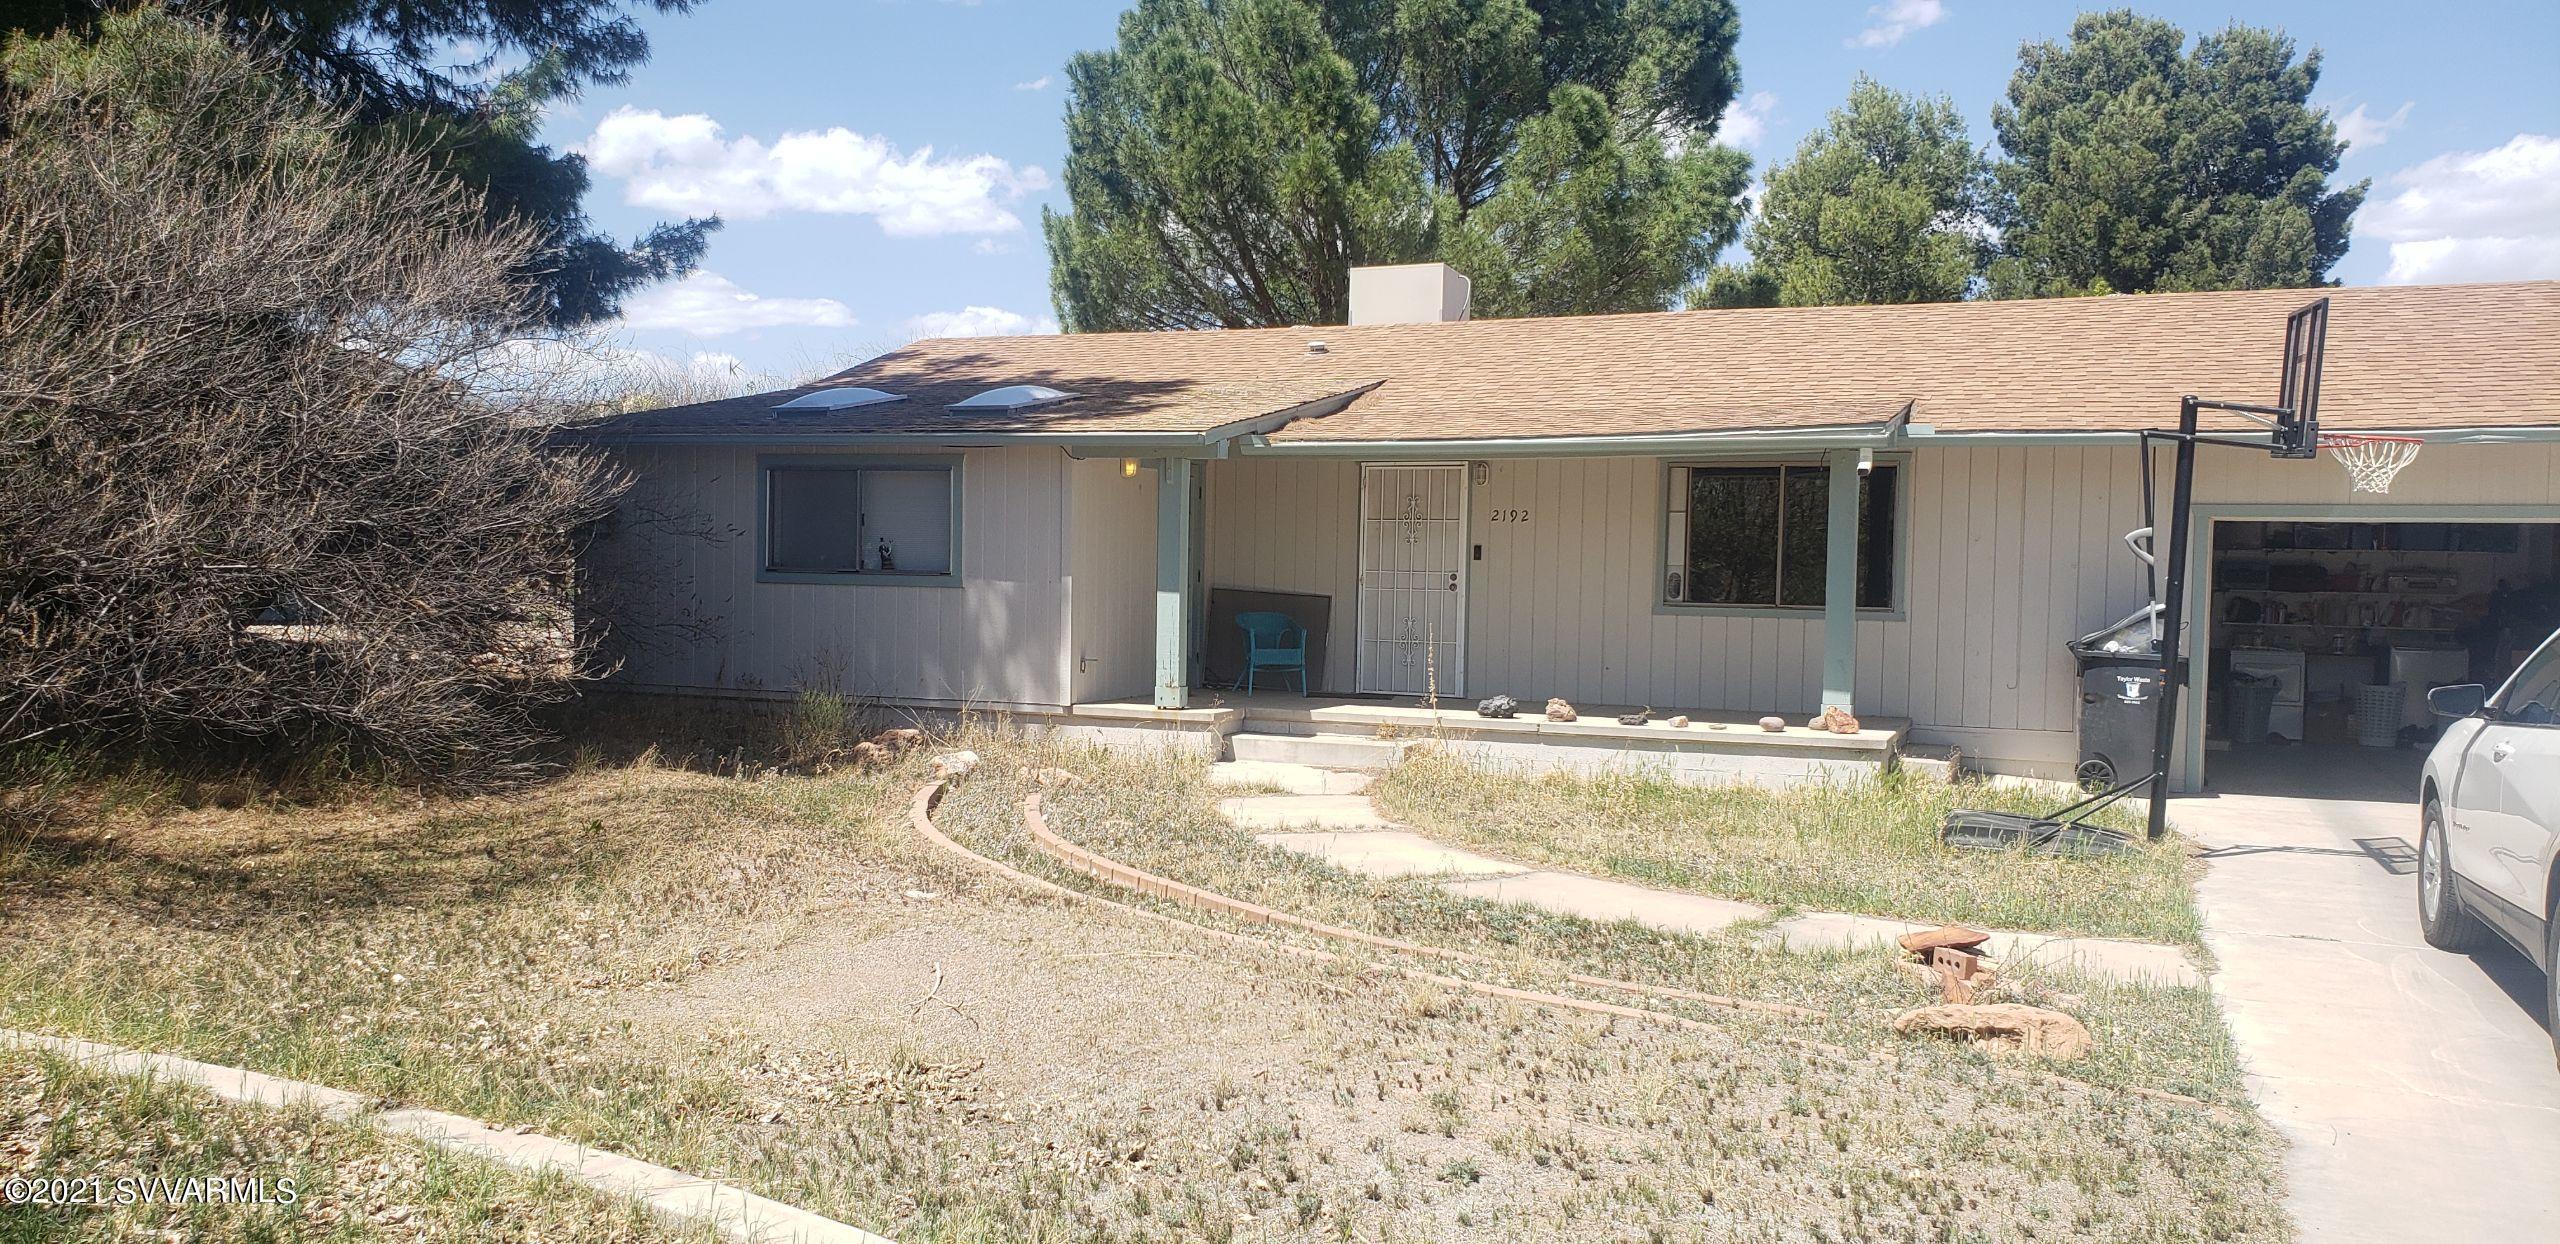 2192 Eastern Drive Cottonwood, AZ 86326